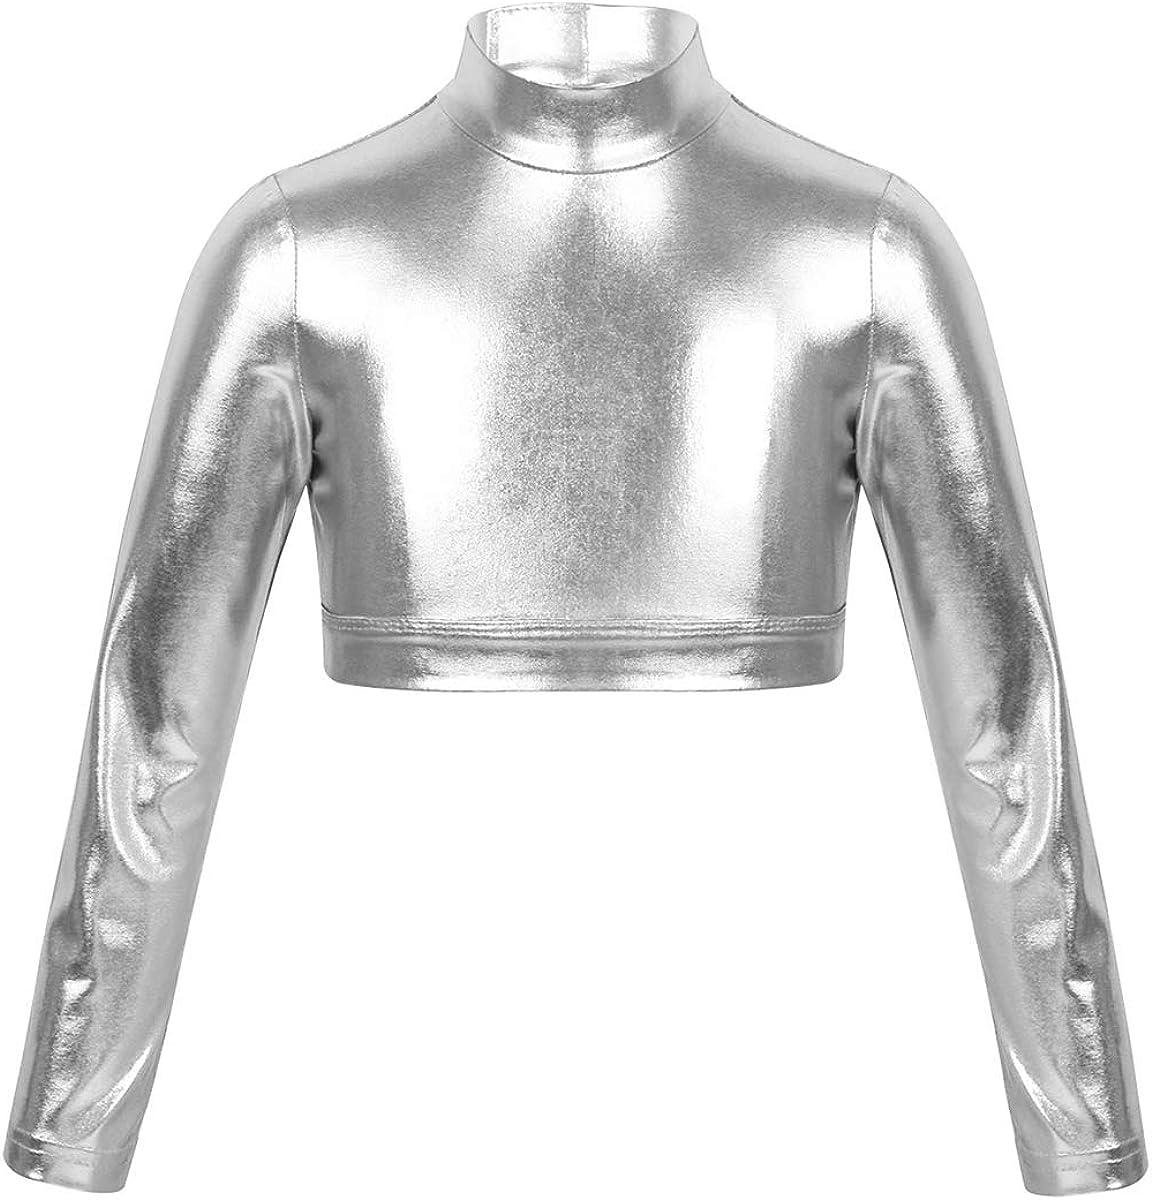 iiniim Kids Girls Mock Turtleneck Crop Top Metallic Shiny Long Sleeve Tank Top T-Shirt Dance Leotard 3/4 Sleeve Black